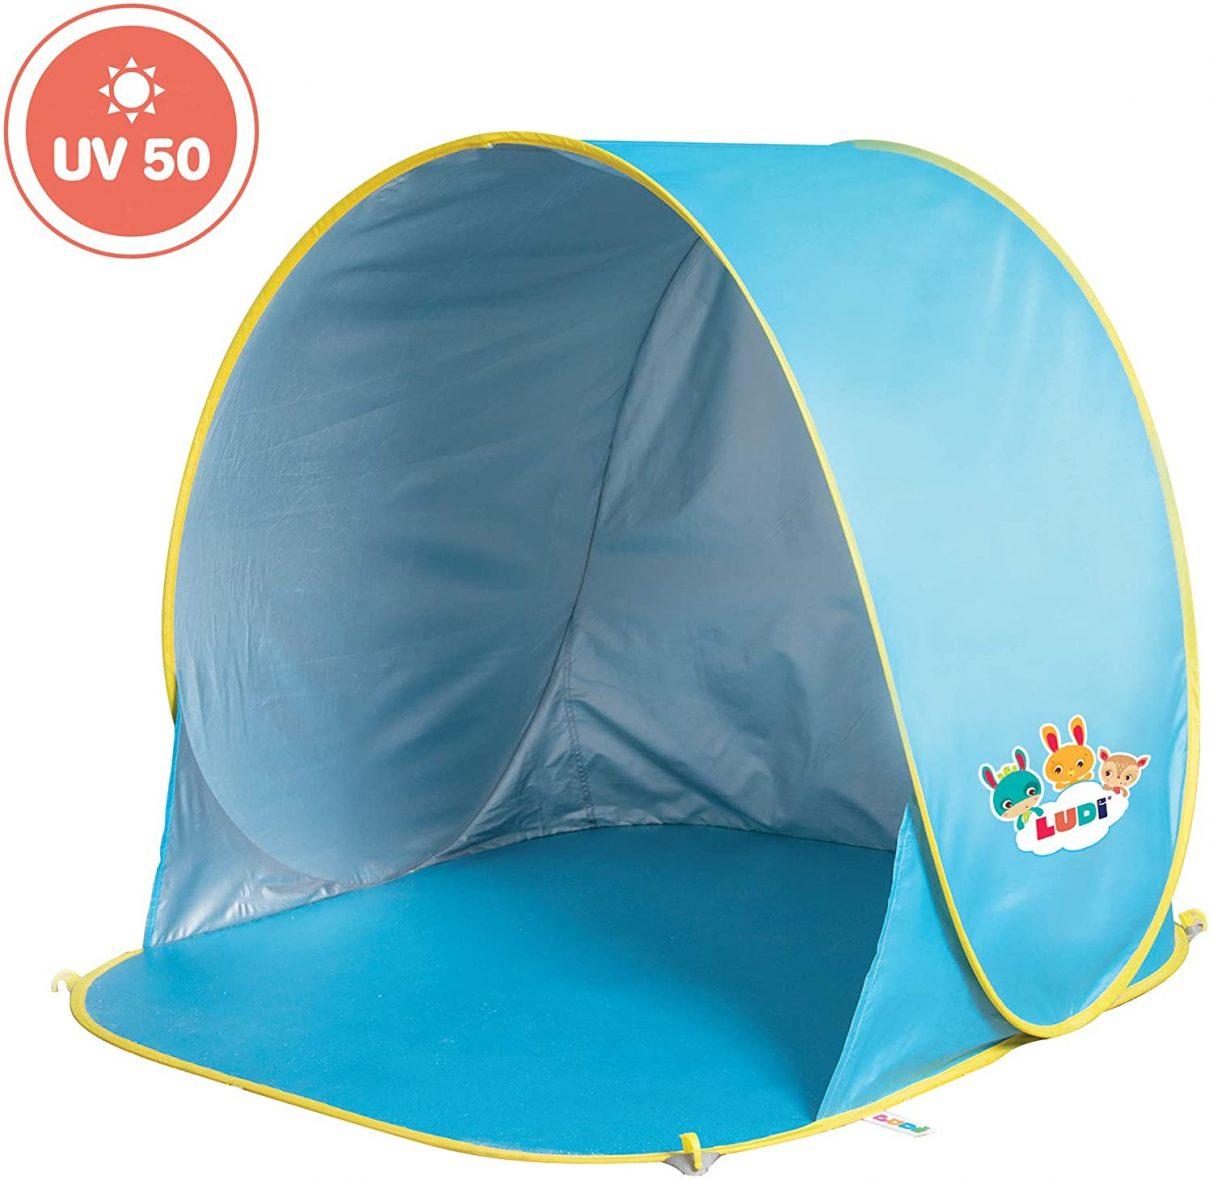 Ludi Tent6